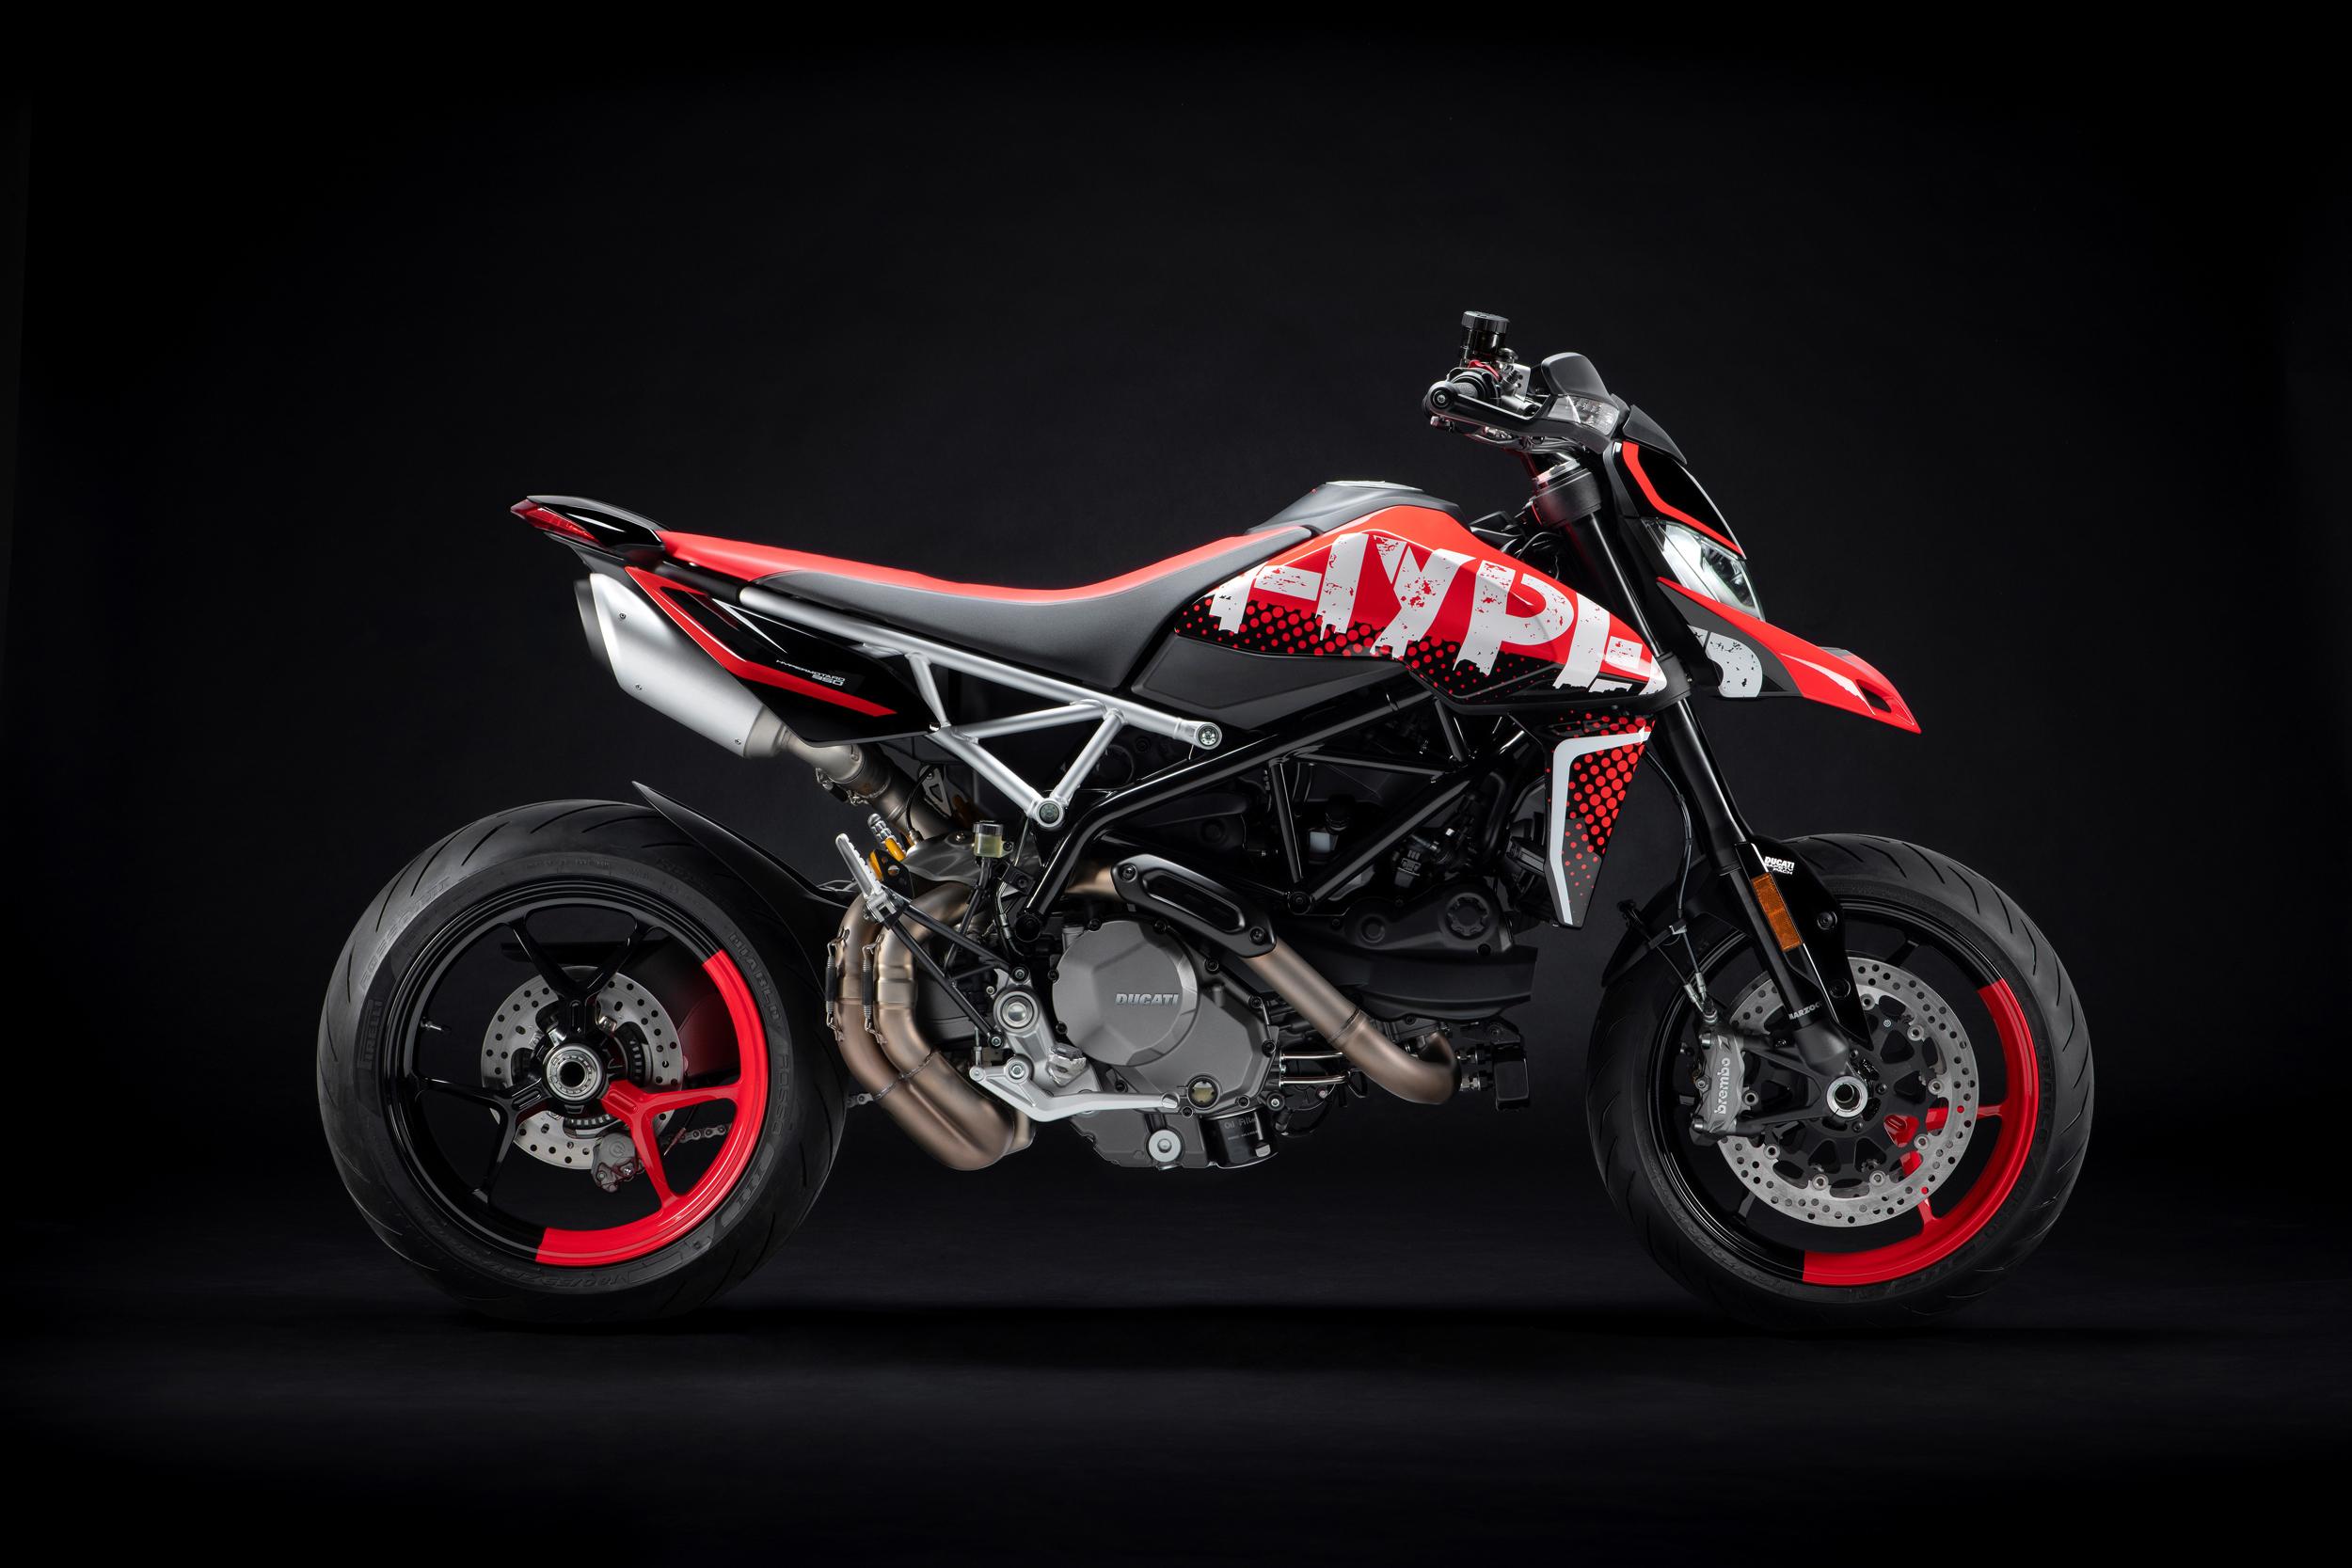 Ducati Hypermotard 950 RVE (2)